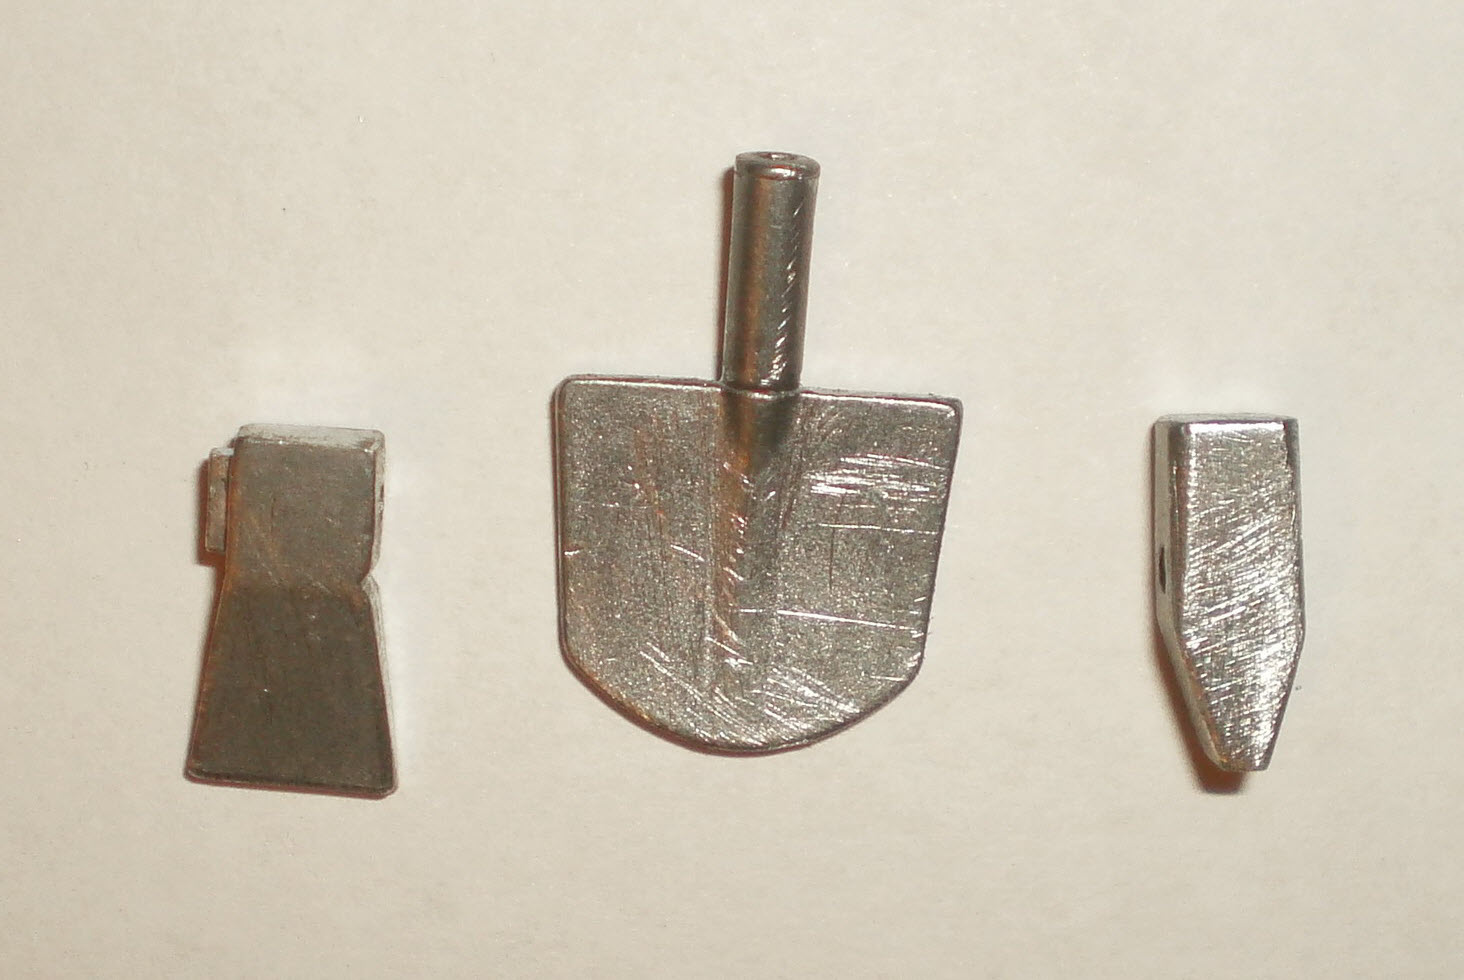 метал детали